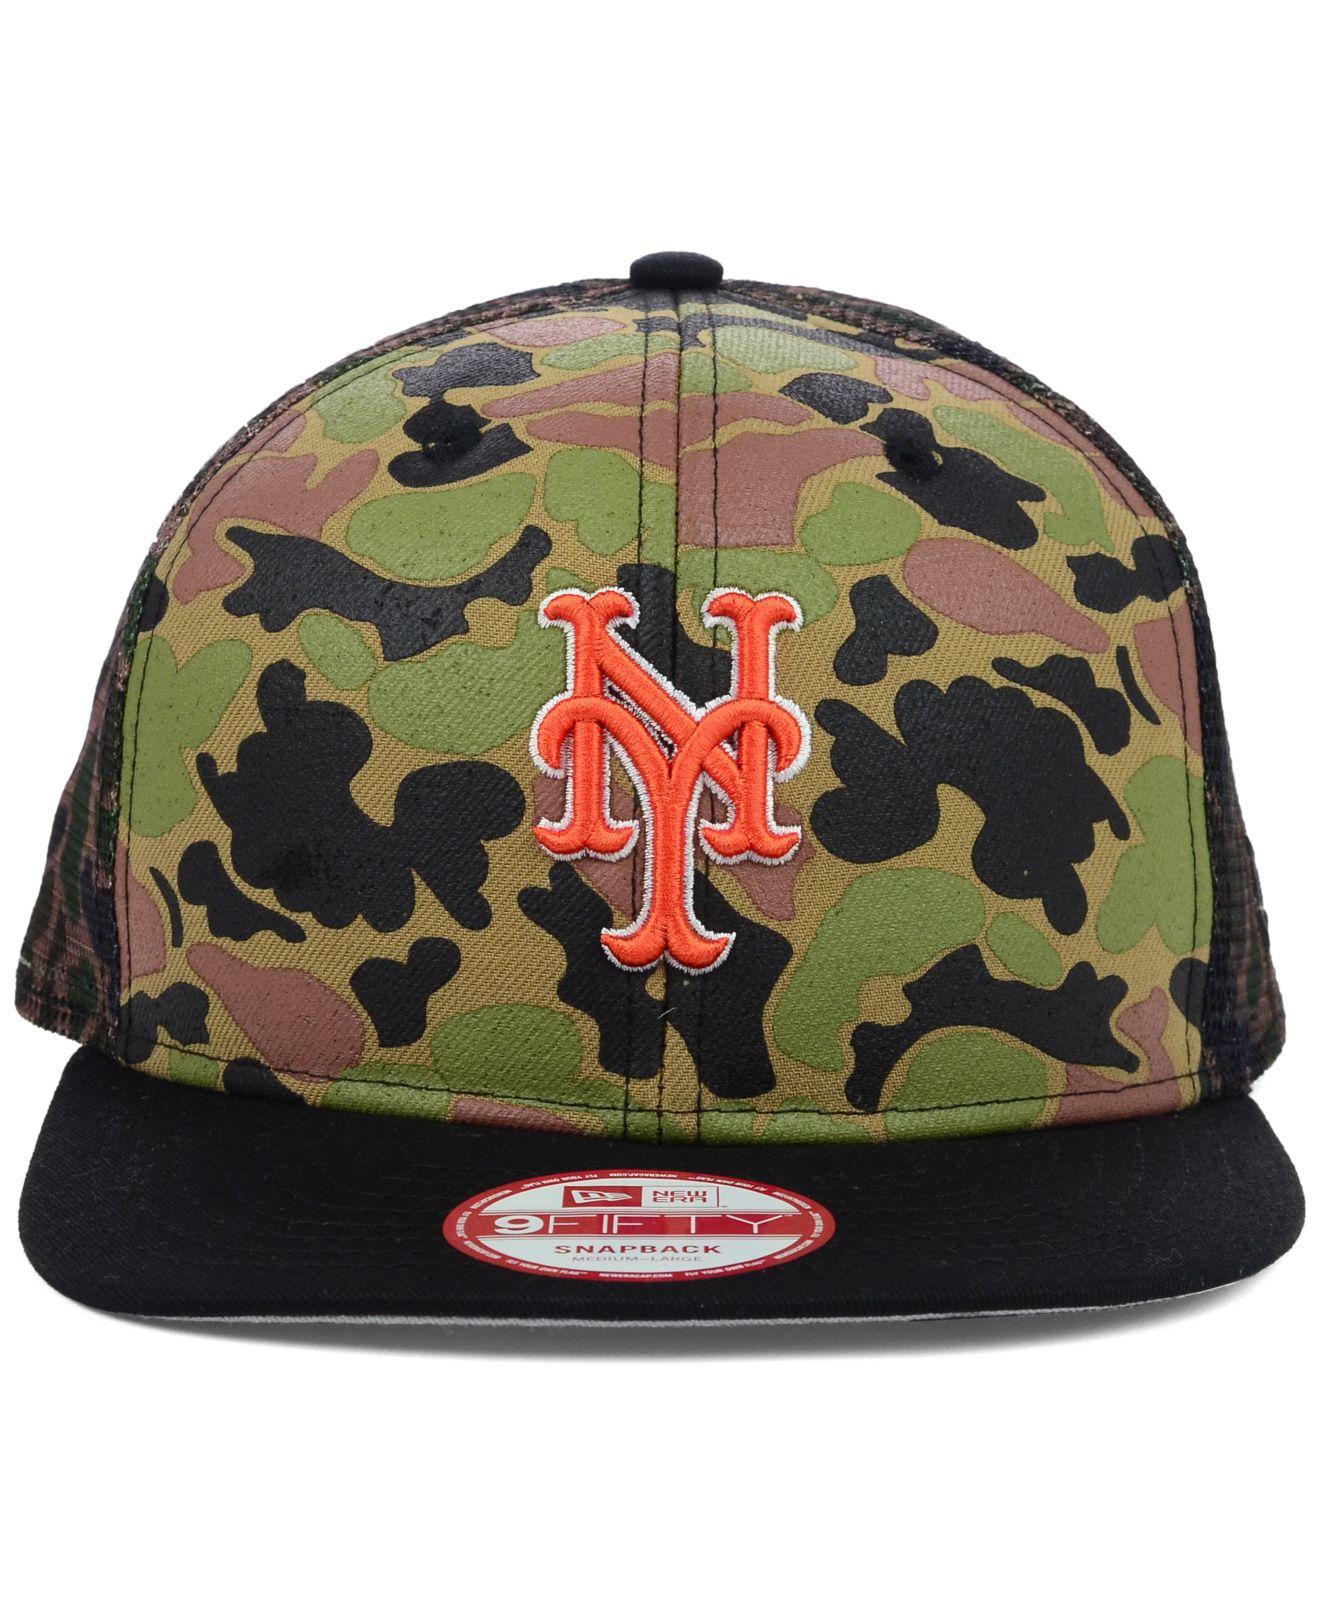 6237ece1194 ... lowest price 6d301 e7920 Lyst - Ktz New York Mets Camo Face Mesh Trucker  9fifty Snapb ...